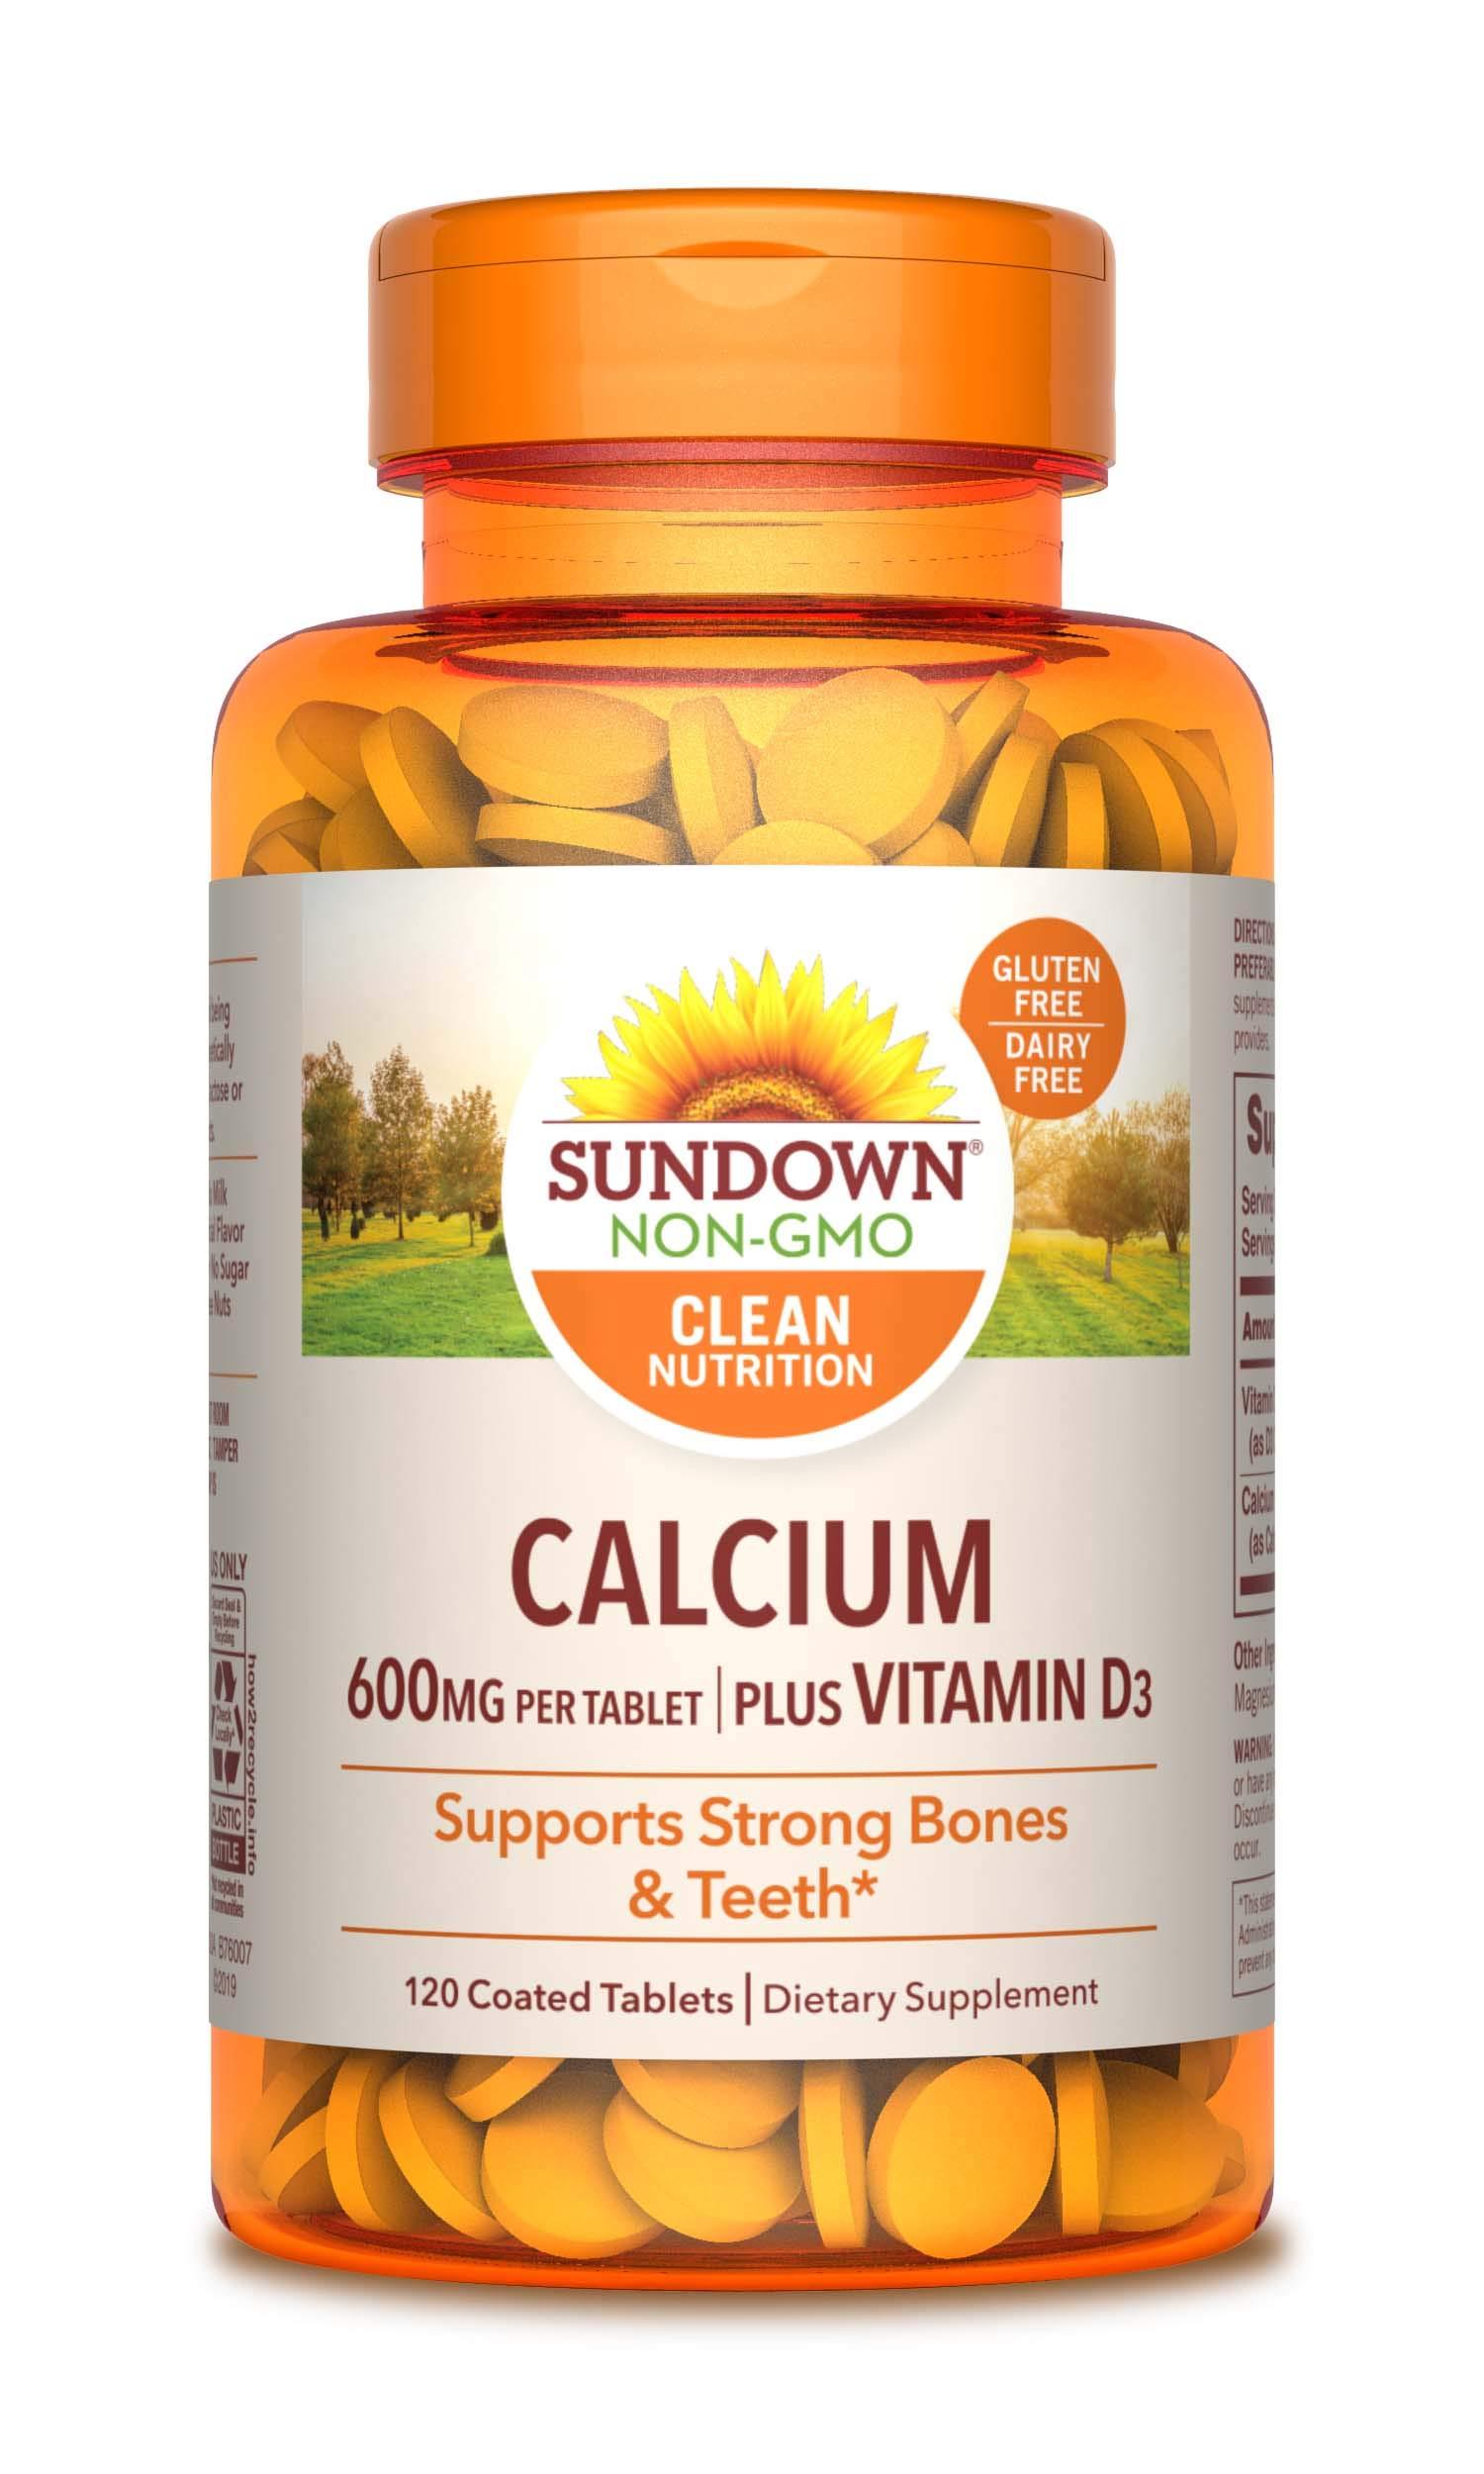 Calcium & Vitamin D by Sundown, Immune Support & Bone Health, 600 mg Calcium & 250IU Vitamin D3, Gluten Free, Dairy Free, 120 Coated Tablets